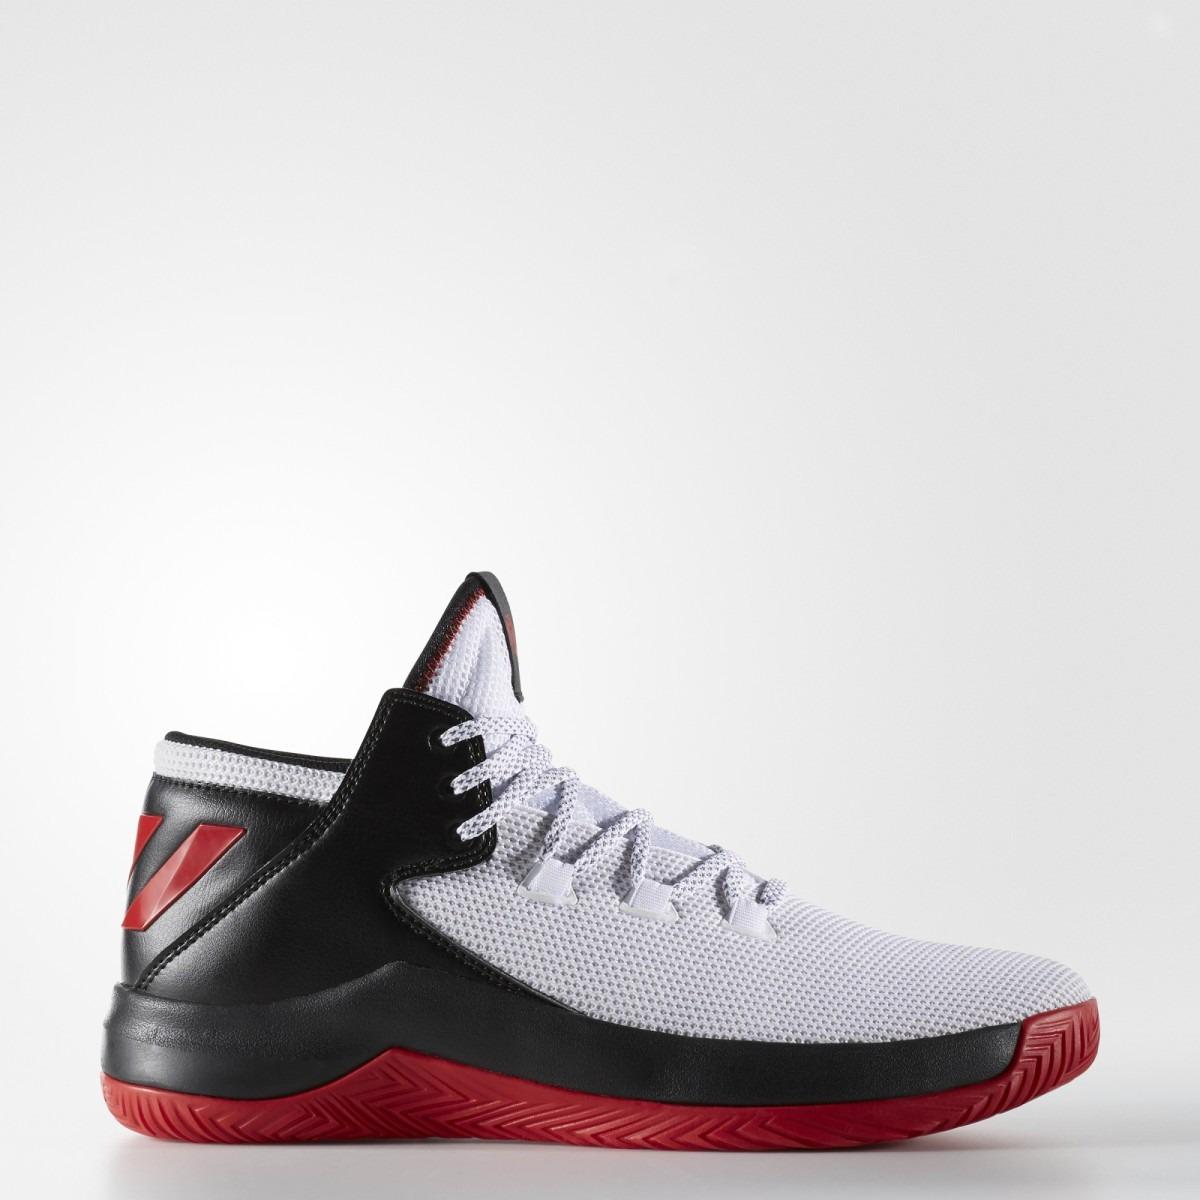 Adidas Sepatu basket D Rose Menace 2 - BY4207